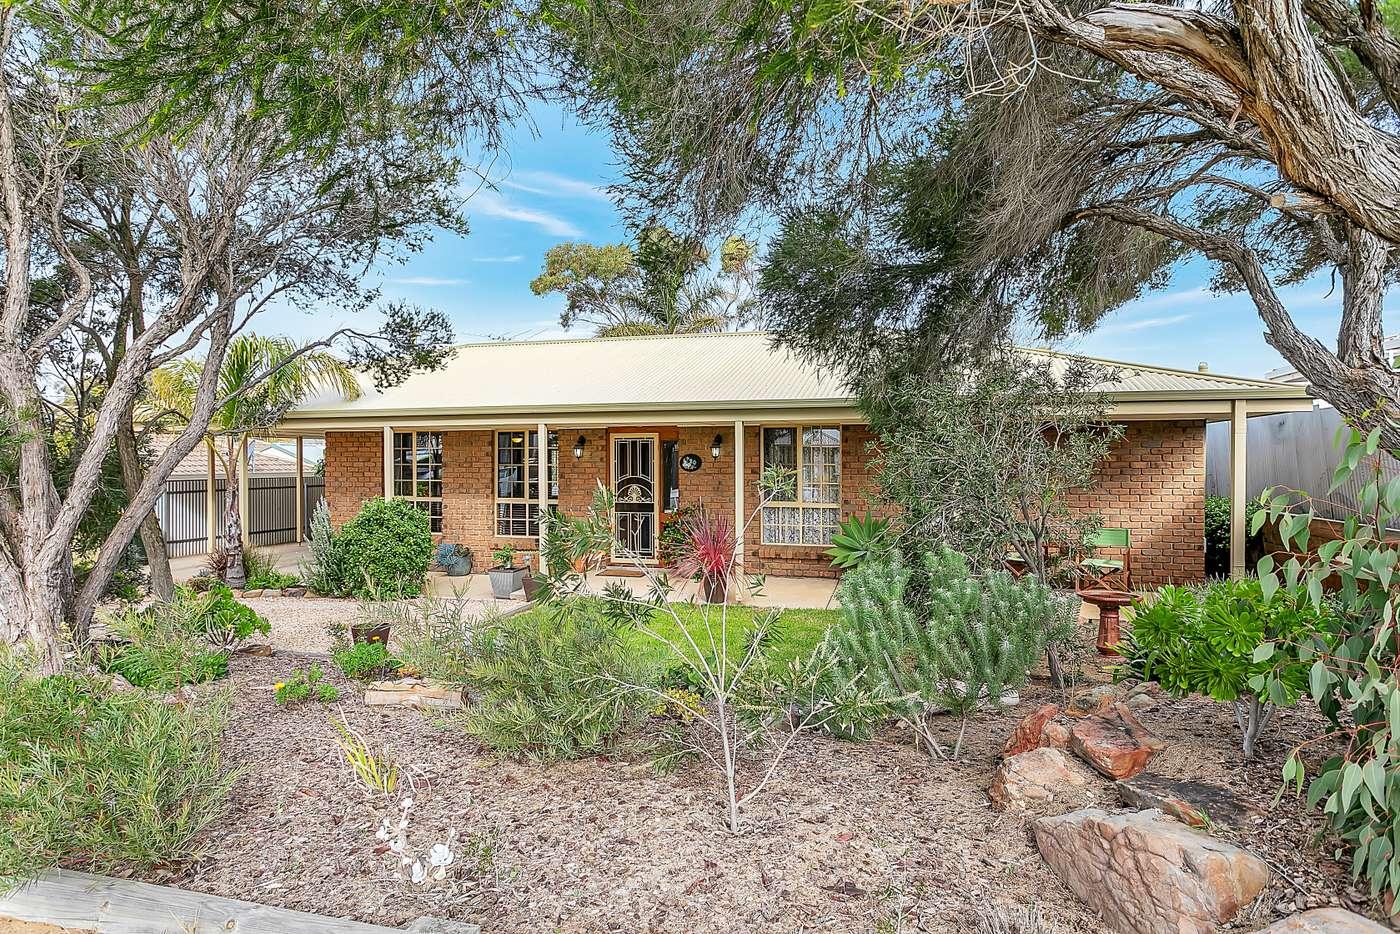 Main view of Homely house listing, 20 Macquarie Street, Moana SA 5169